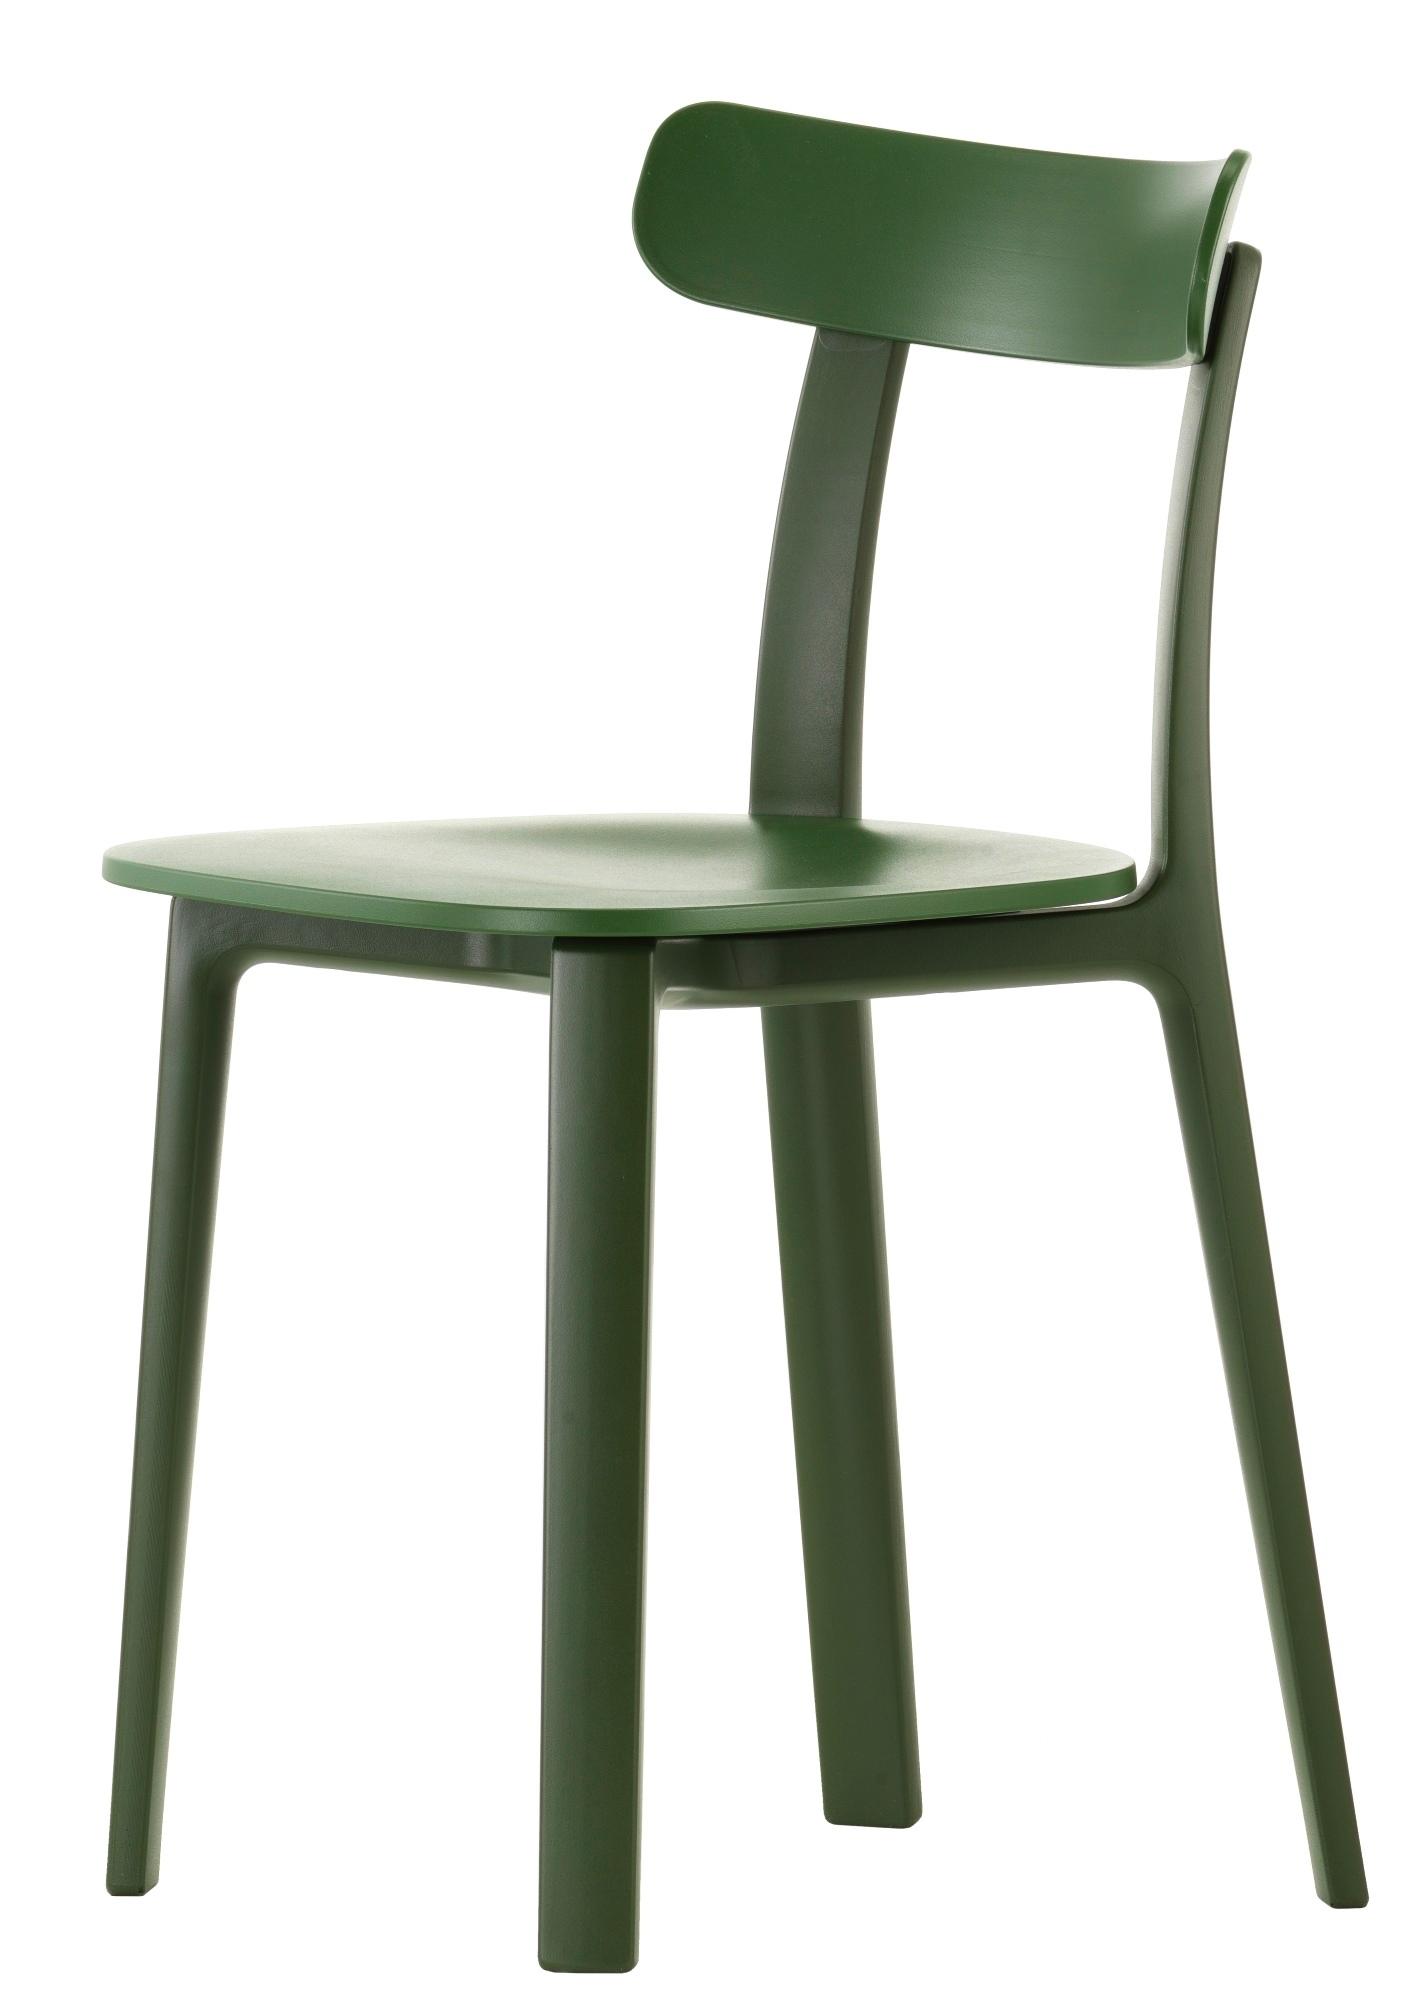 All Plastic Chair chaise d'extérieur Vitra